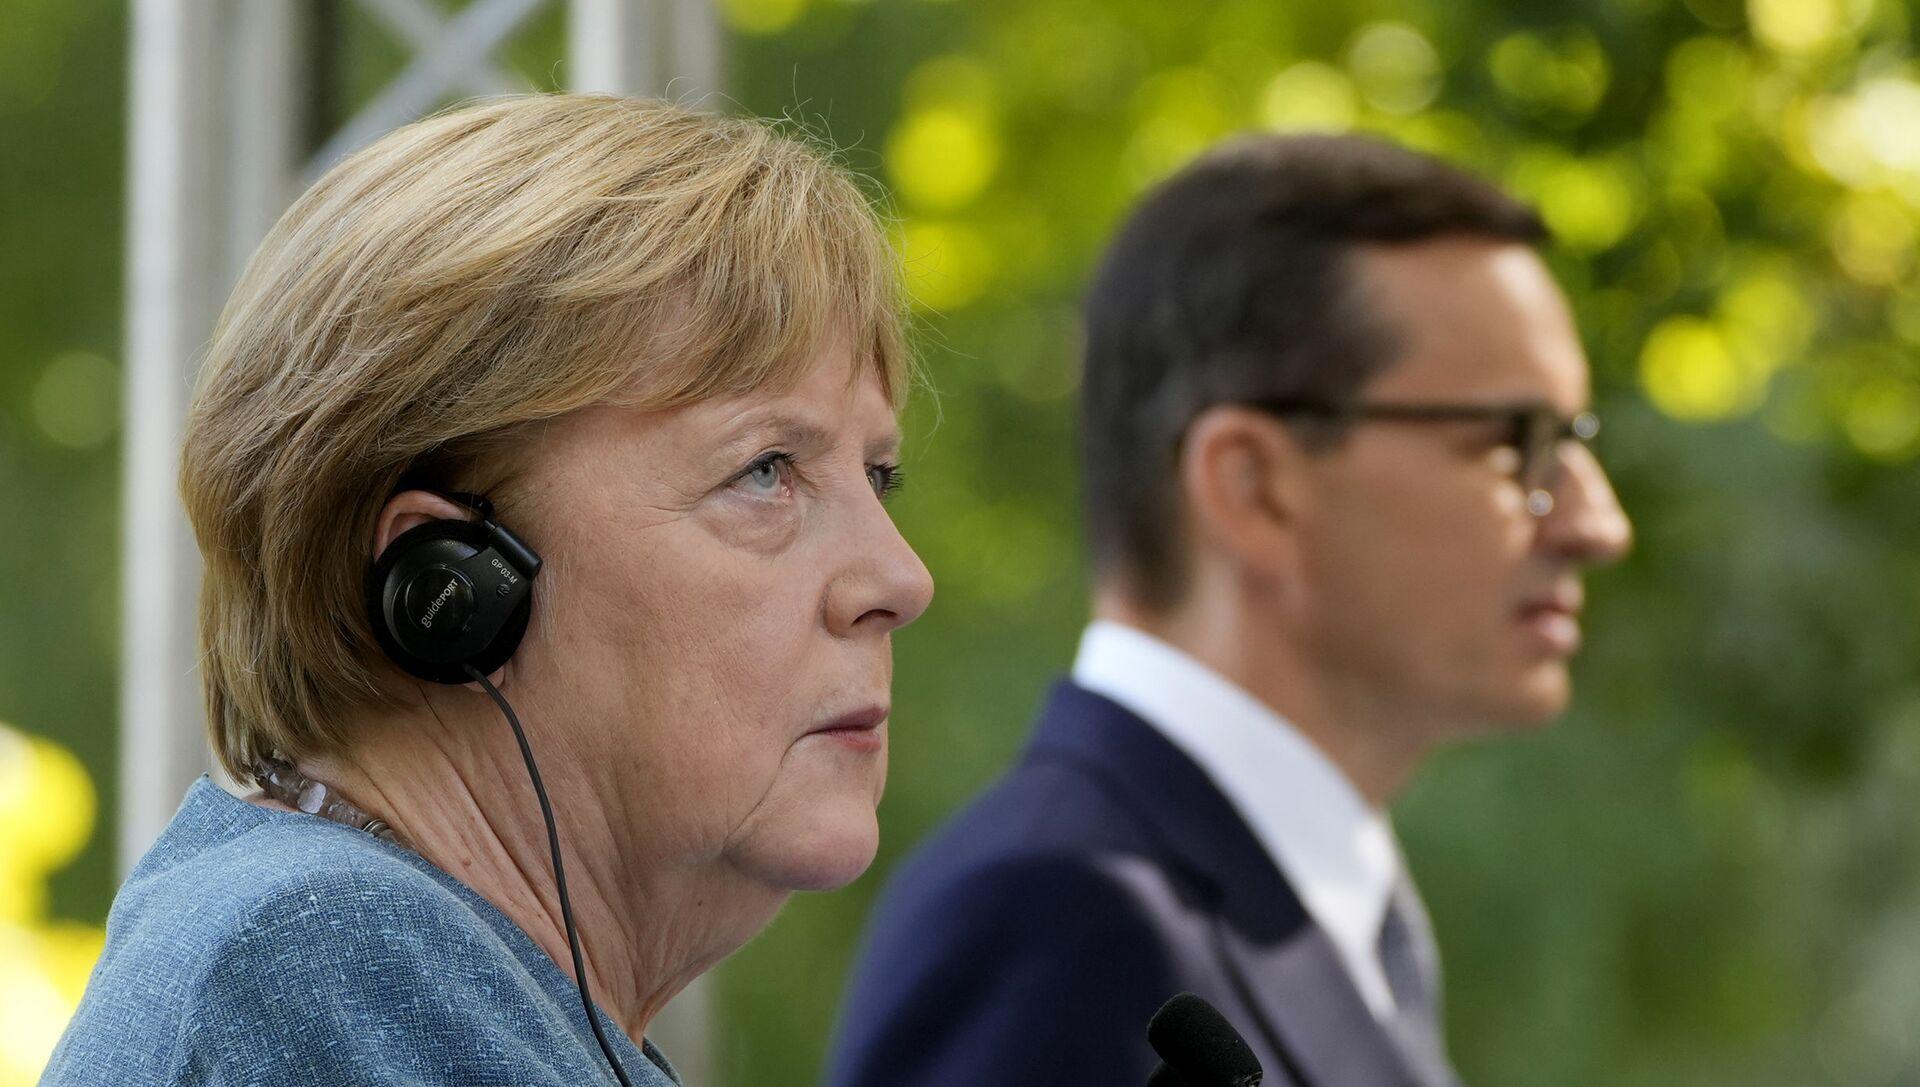 Angela Merkel et Mateusz Morawiecki, le 11 septembre 2021 - Sputnik France, 1920, 13.09.2021